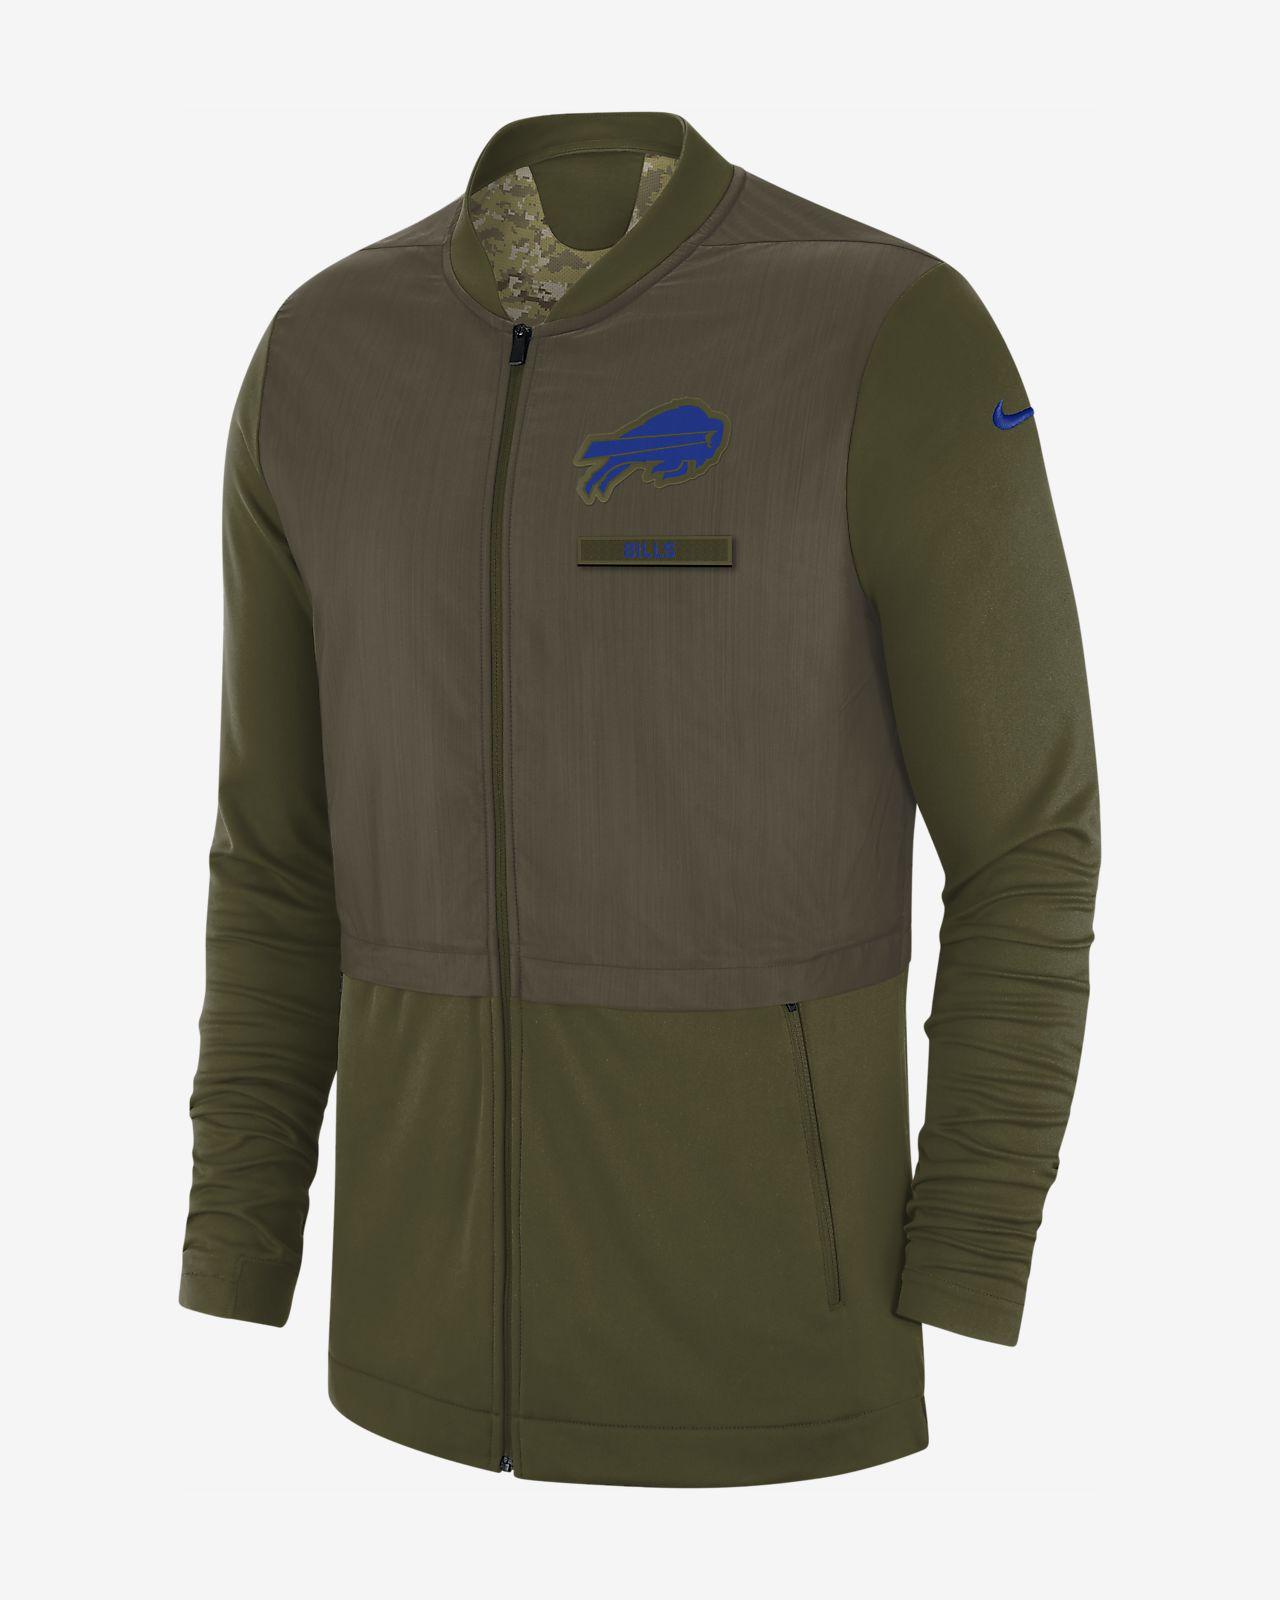 Nike Elite Hybrid Salute to Service (NFL Bills) Men's Full-Zip Jacket